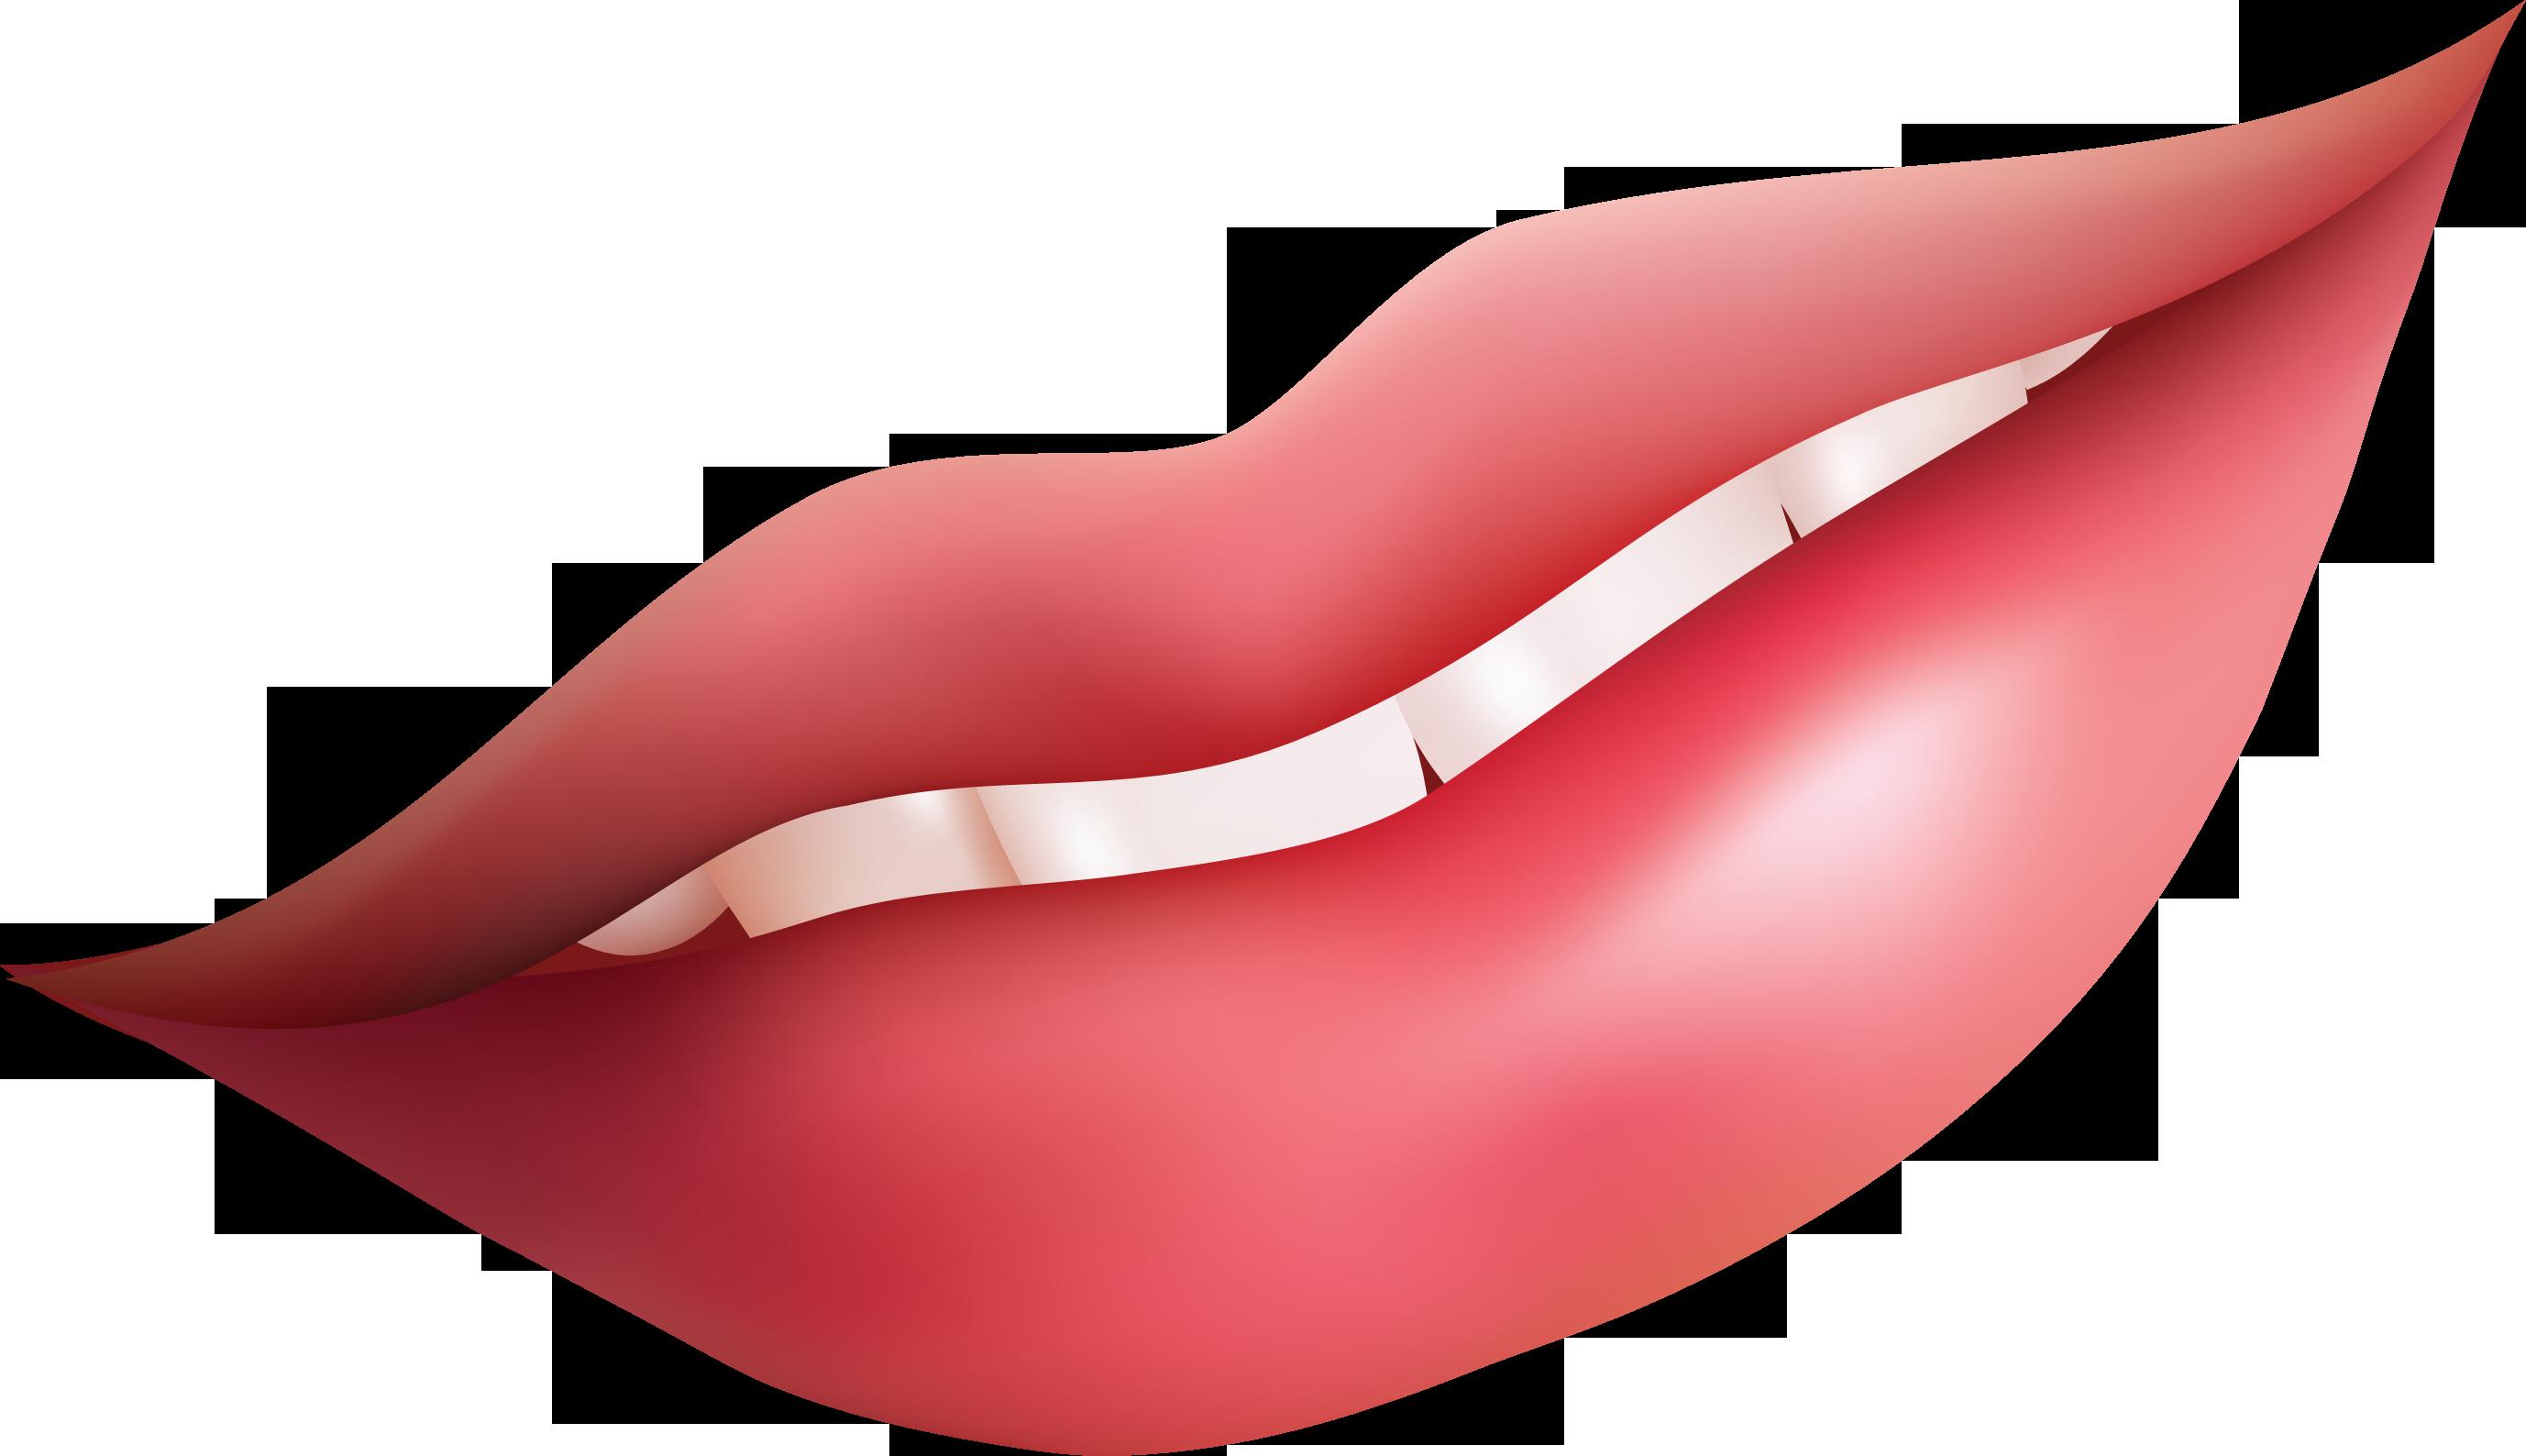 2755x1588 Lips Image Free Kiss Clip Art